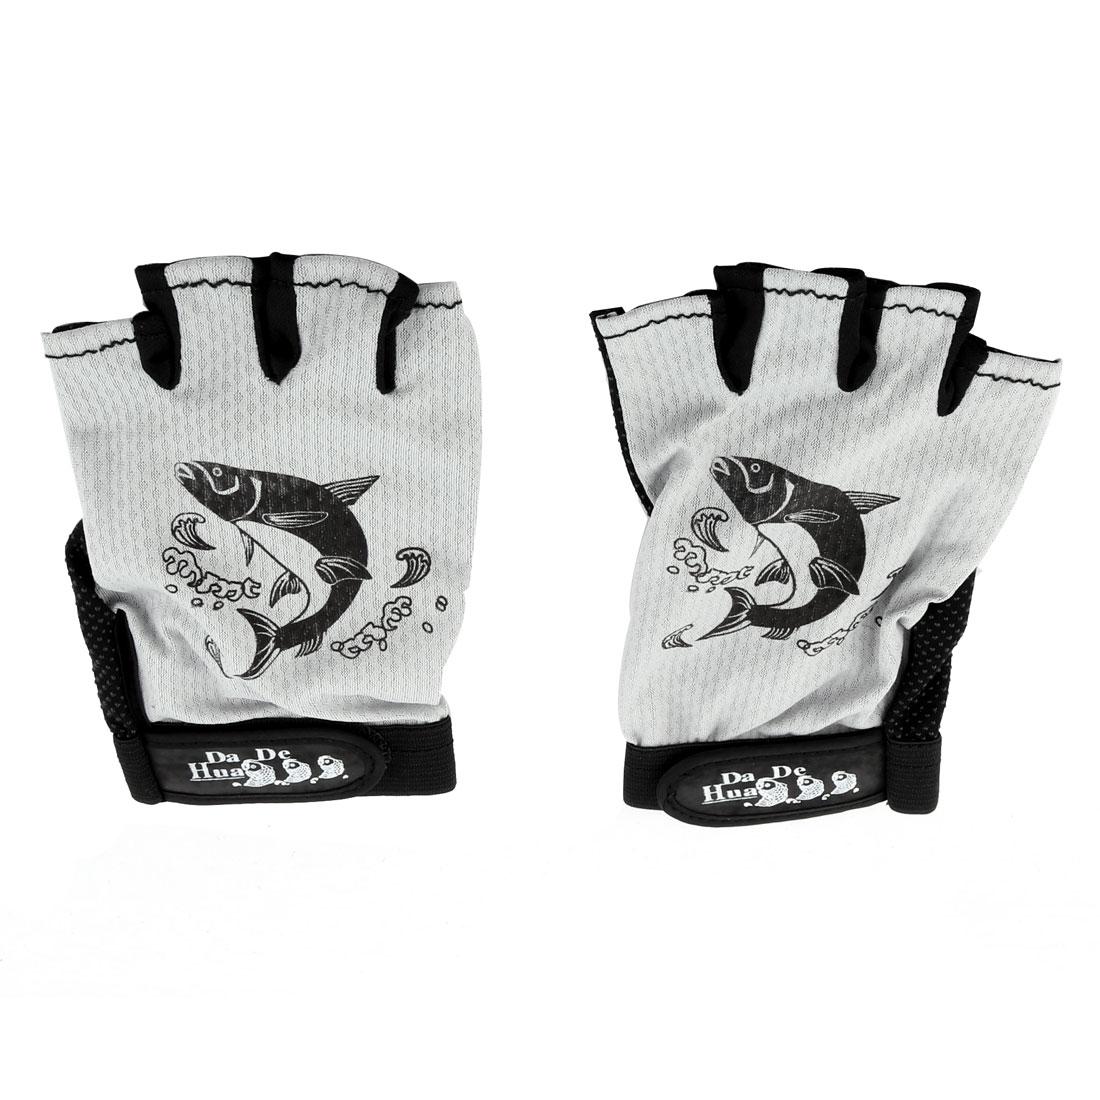 Fisherman Fishing Nylon Half Finger Hook Loop Antislip Gloves Gray Black Pair